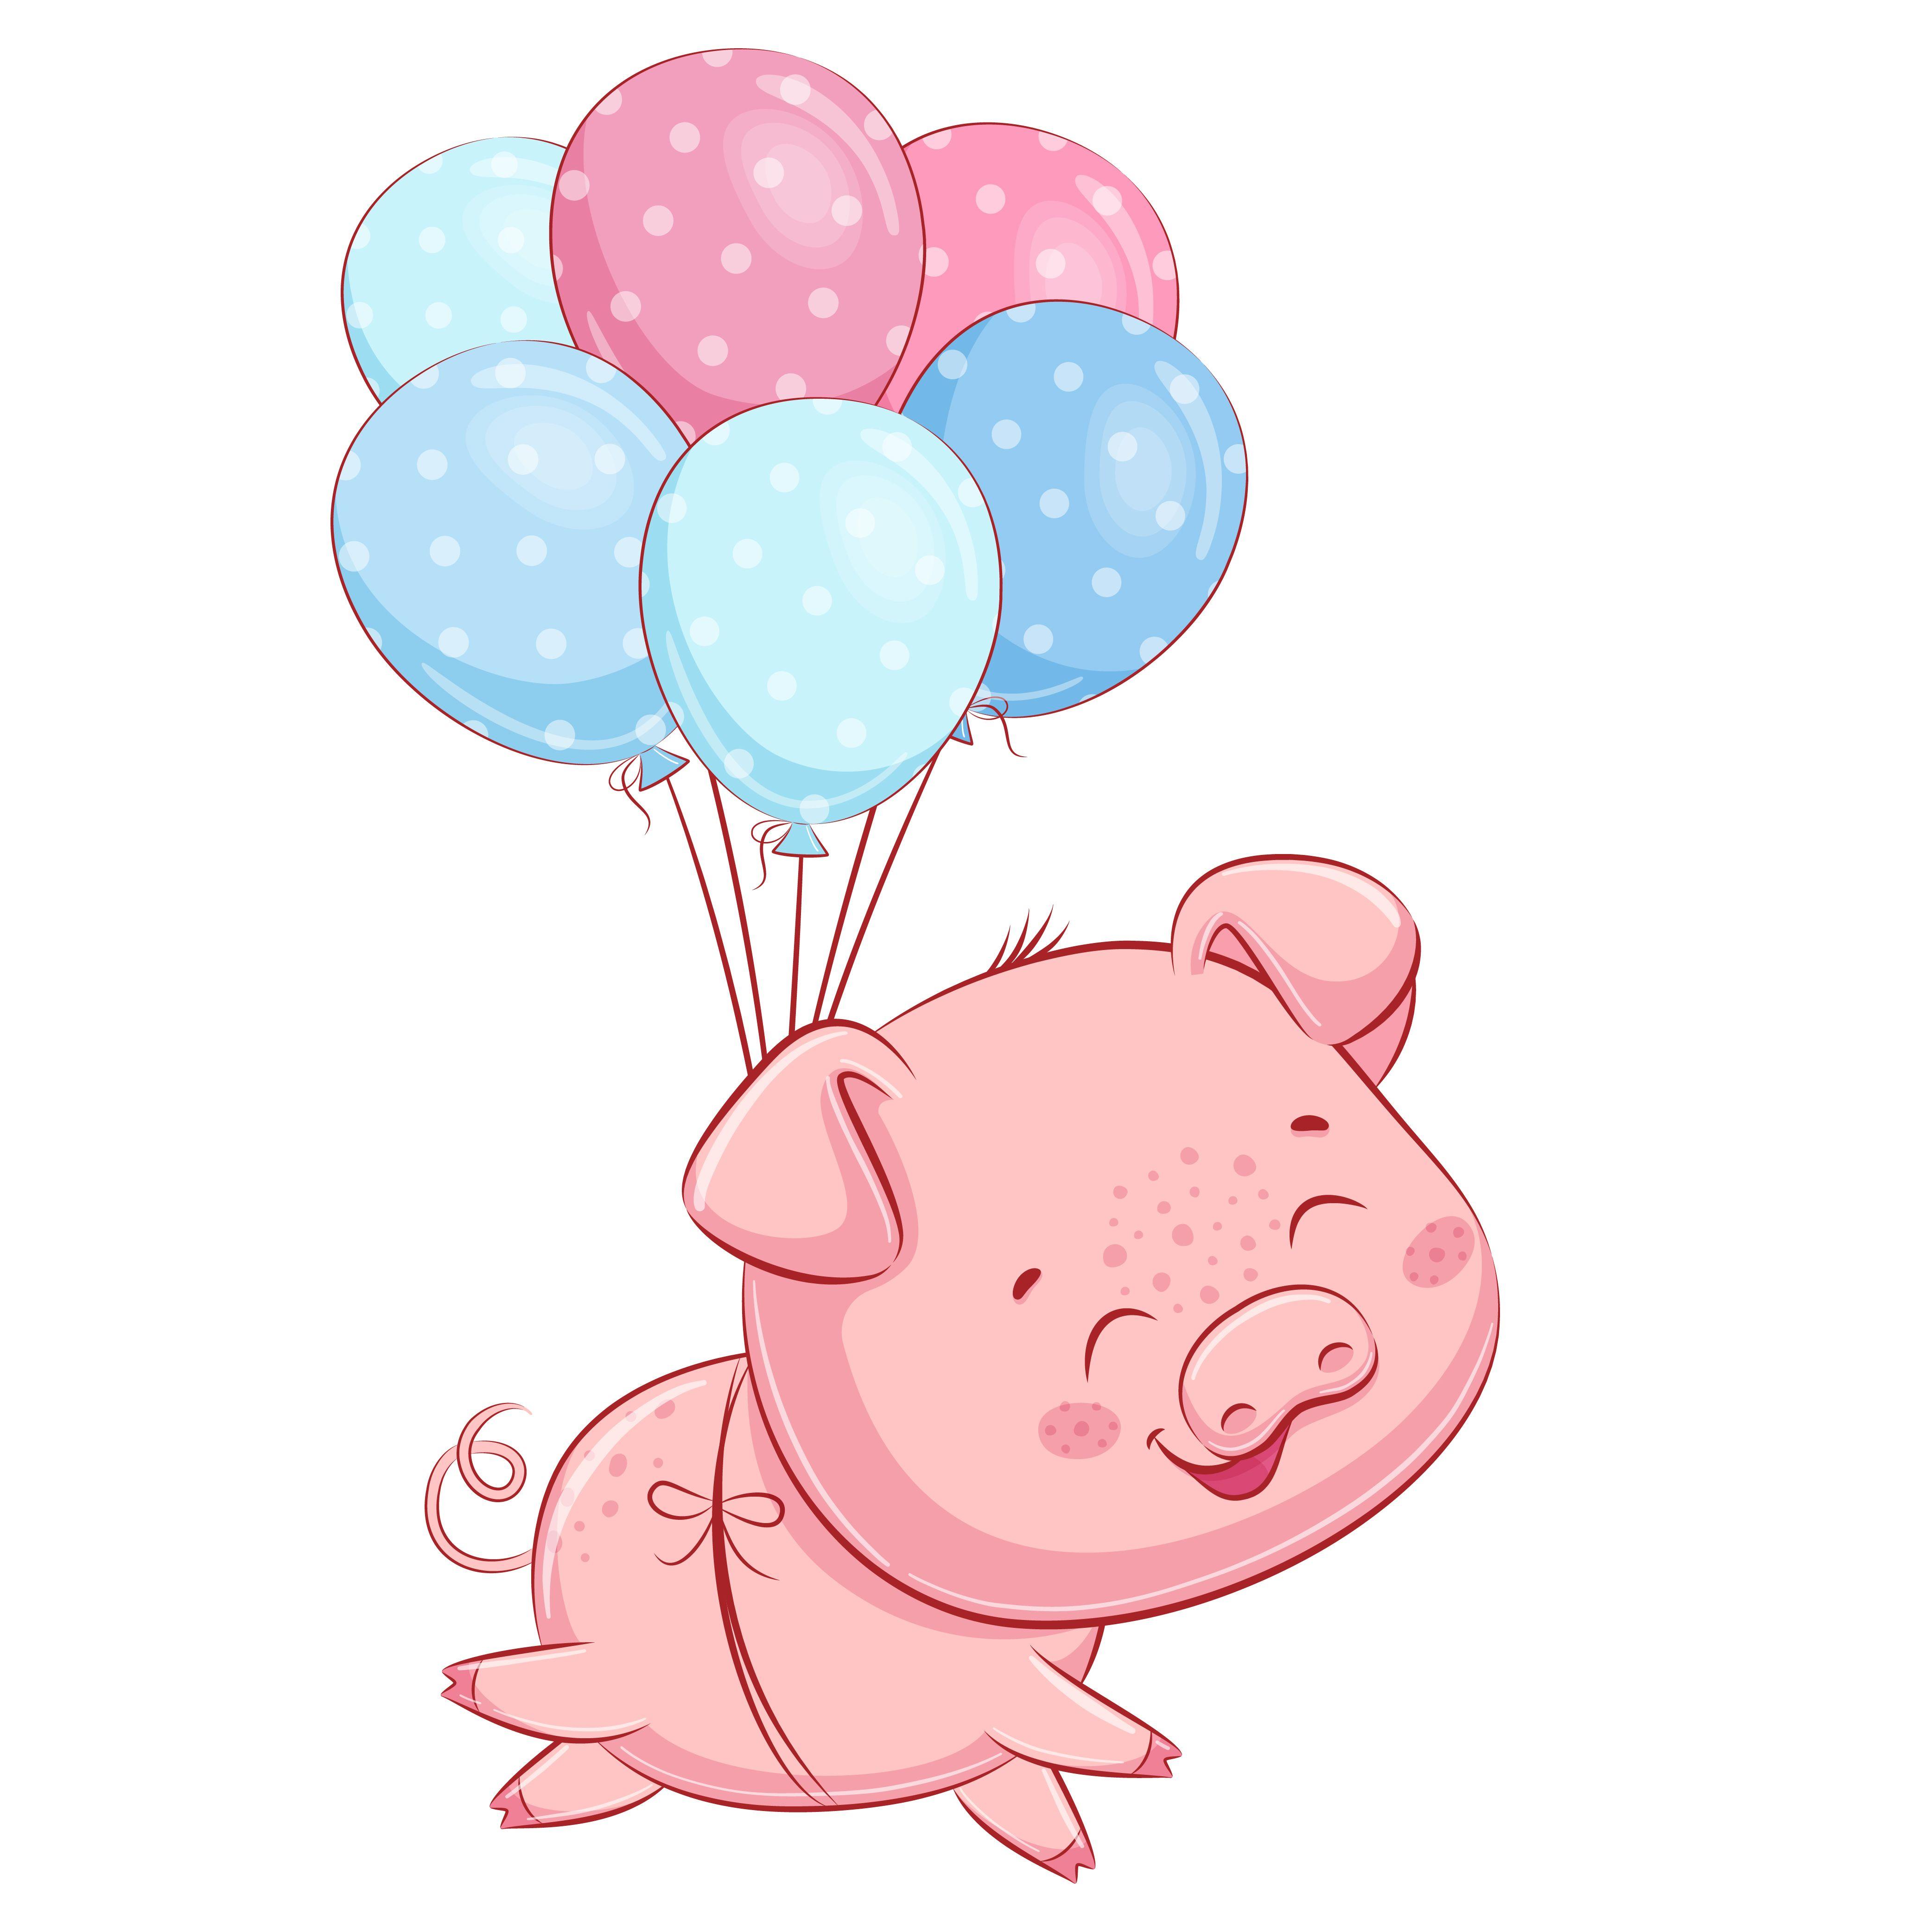 Cute Pig Clipart Png Jpg Eps Piggy Clipart Farm Animal Digital Download In 2021 Pig Clipart Cute Pigs Clip Art